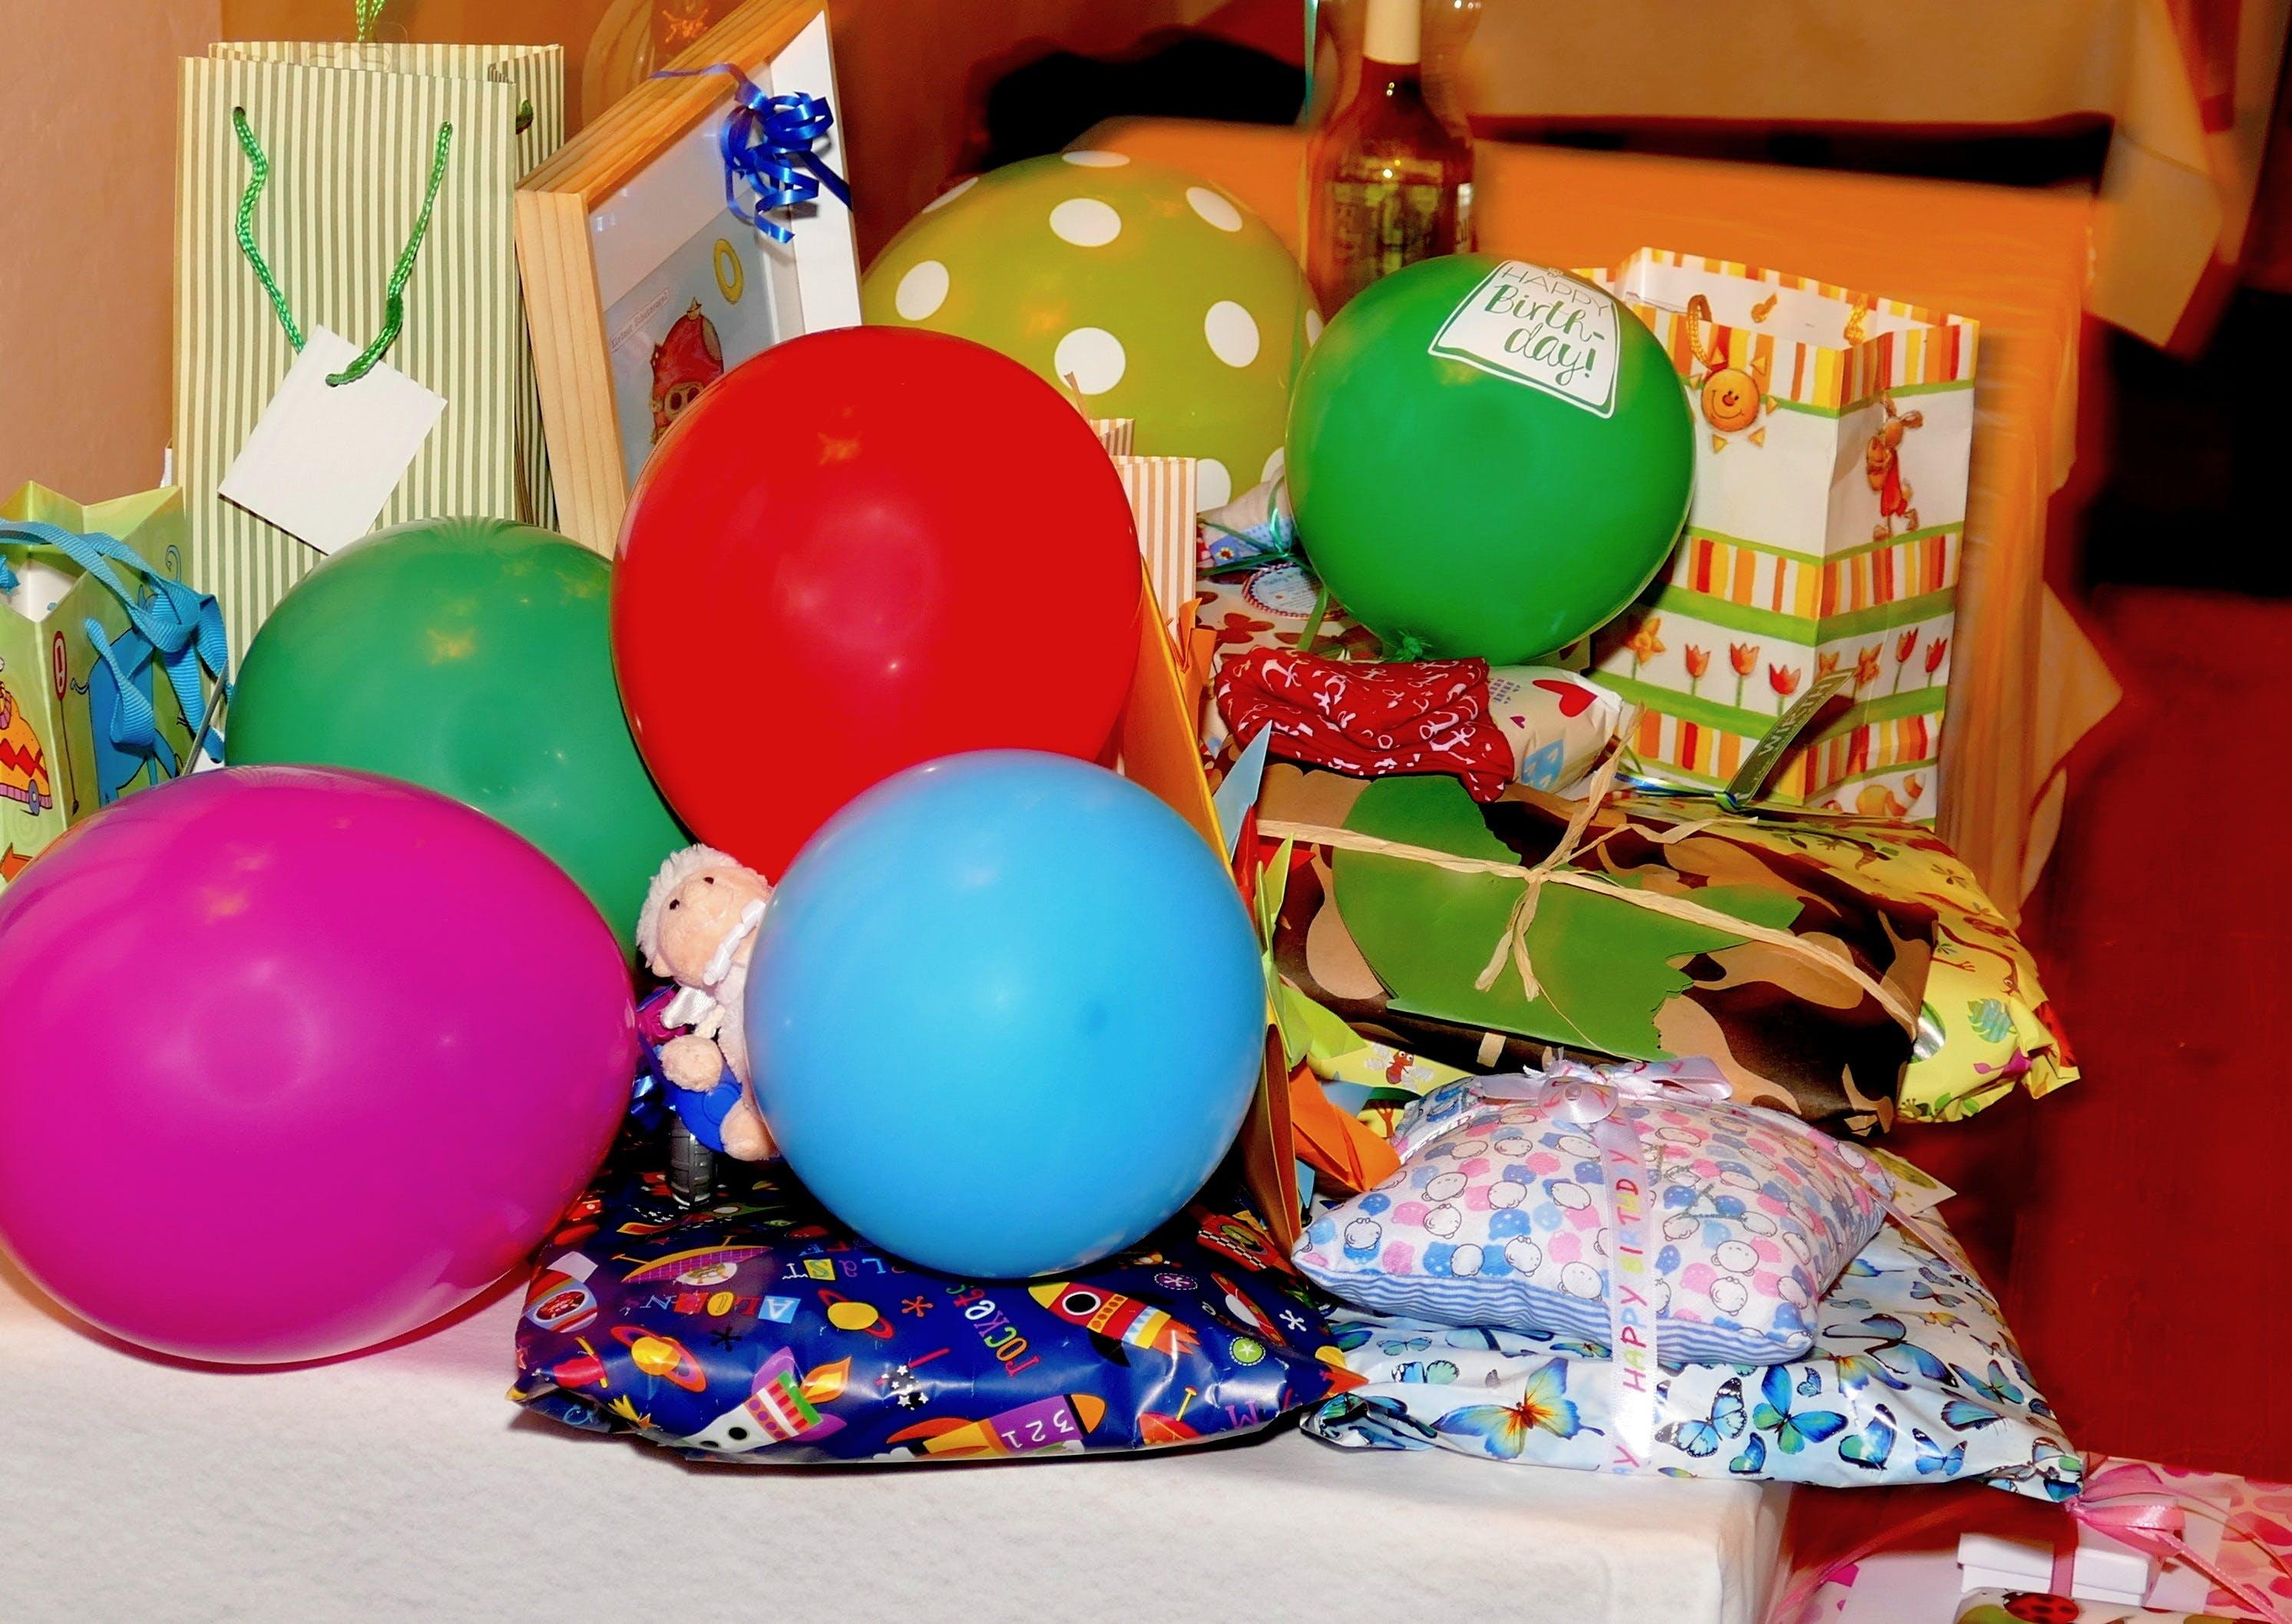 Free stock photo of colorful, balloon, birthday, bright